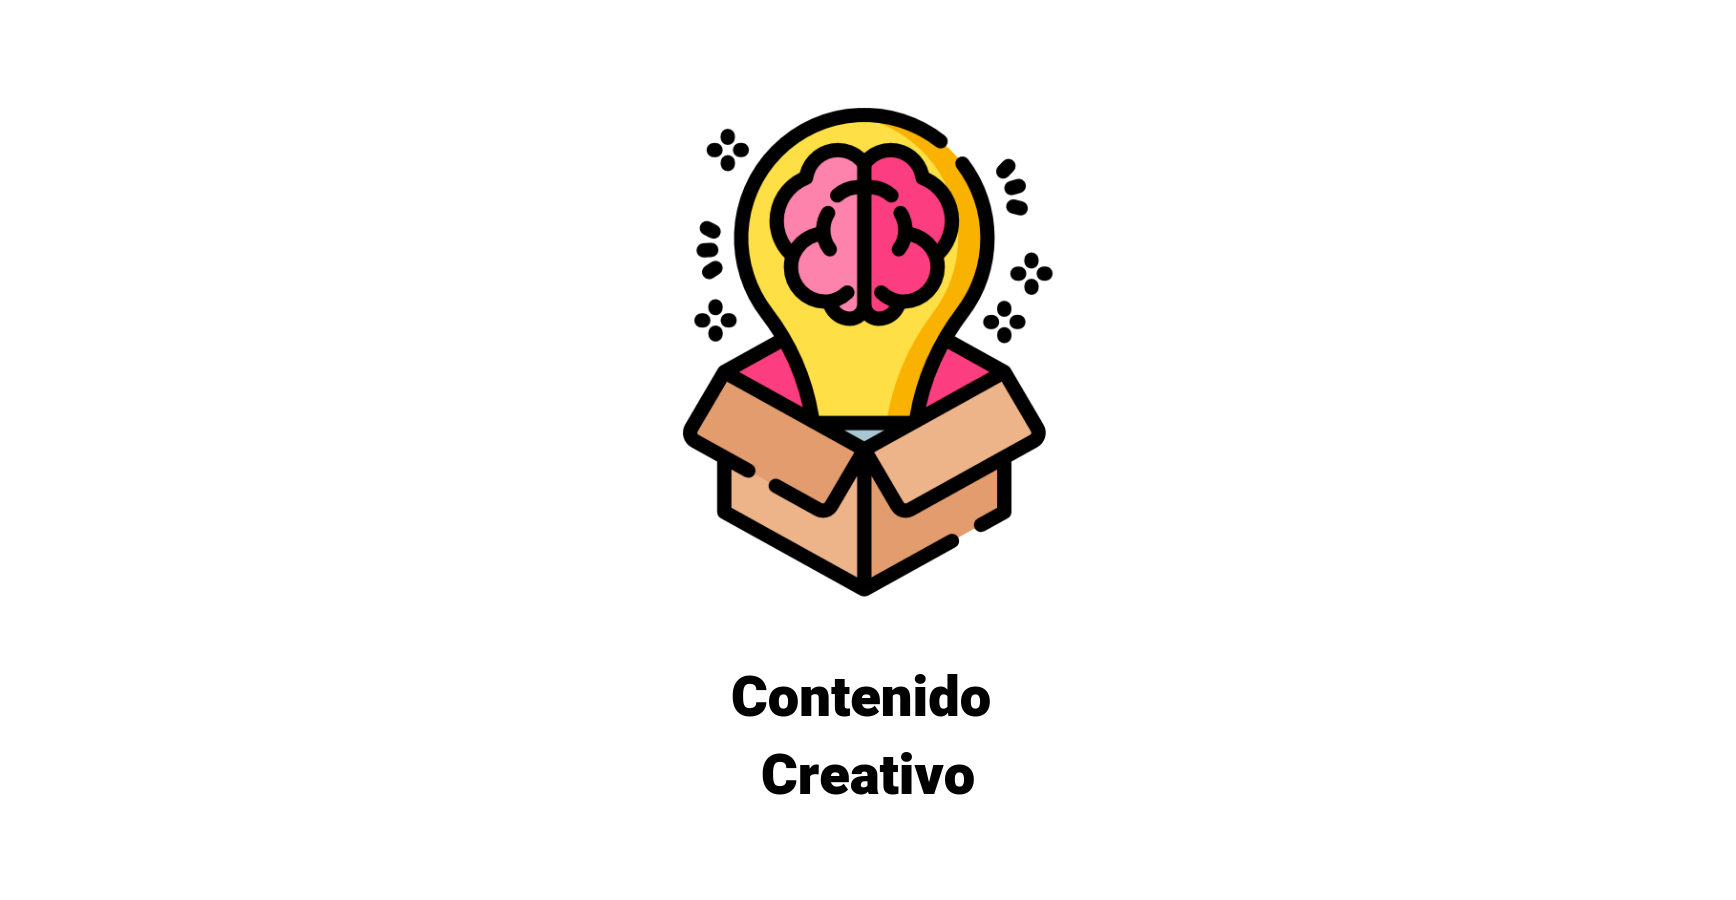 Definición de contenido creativo